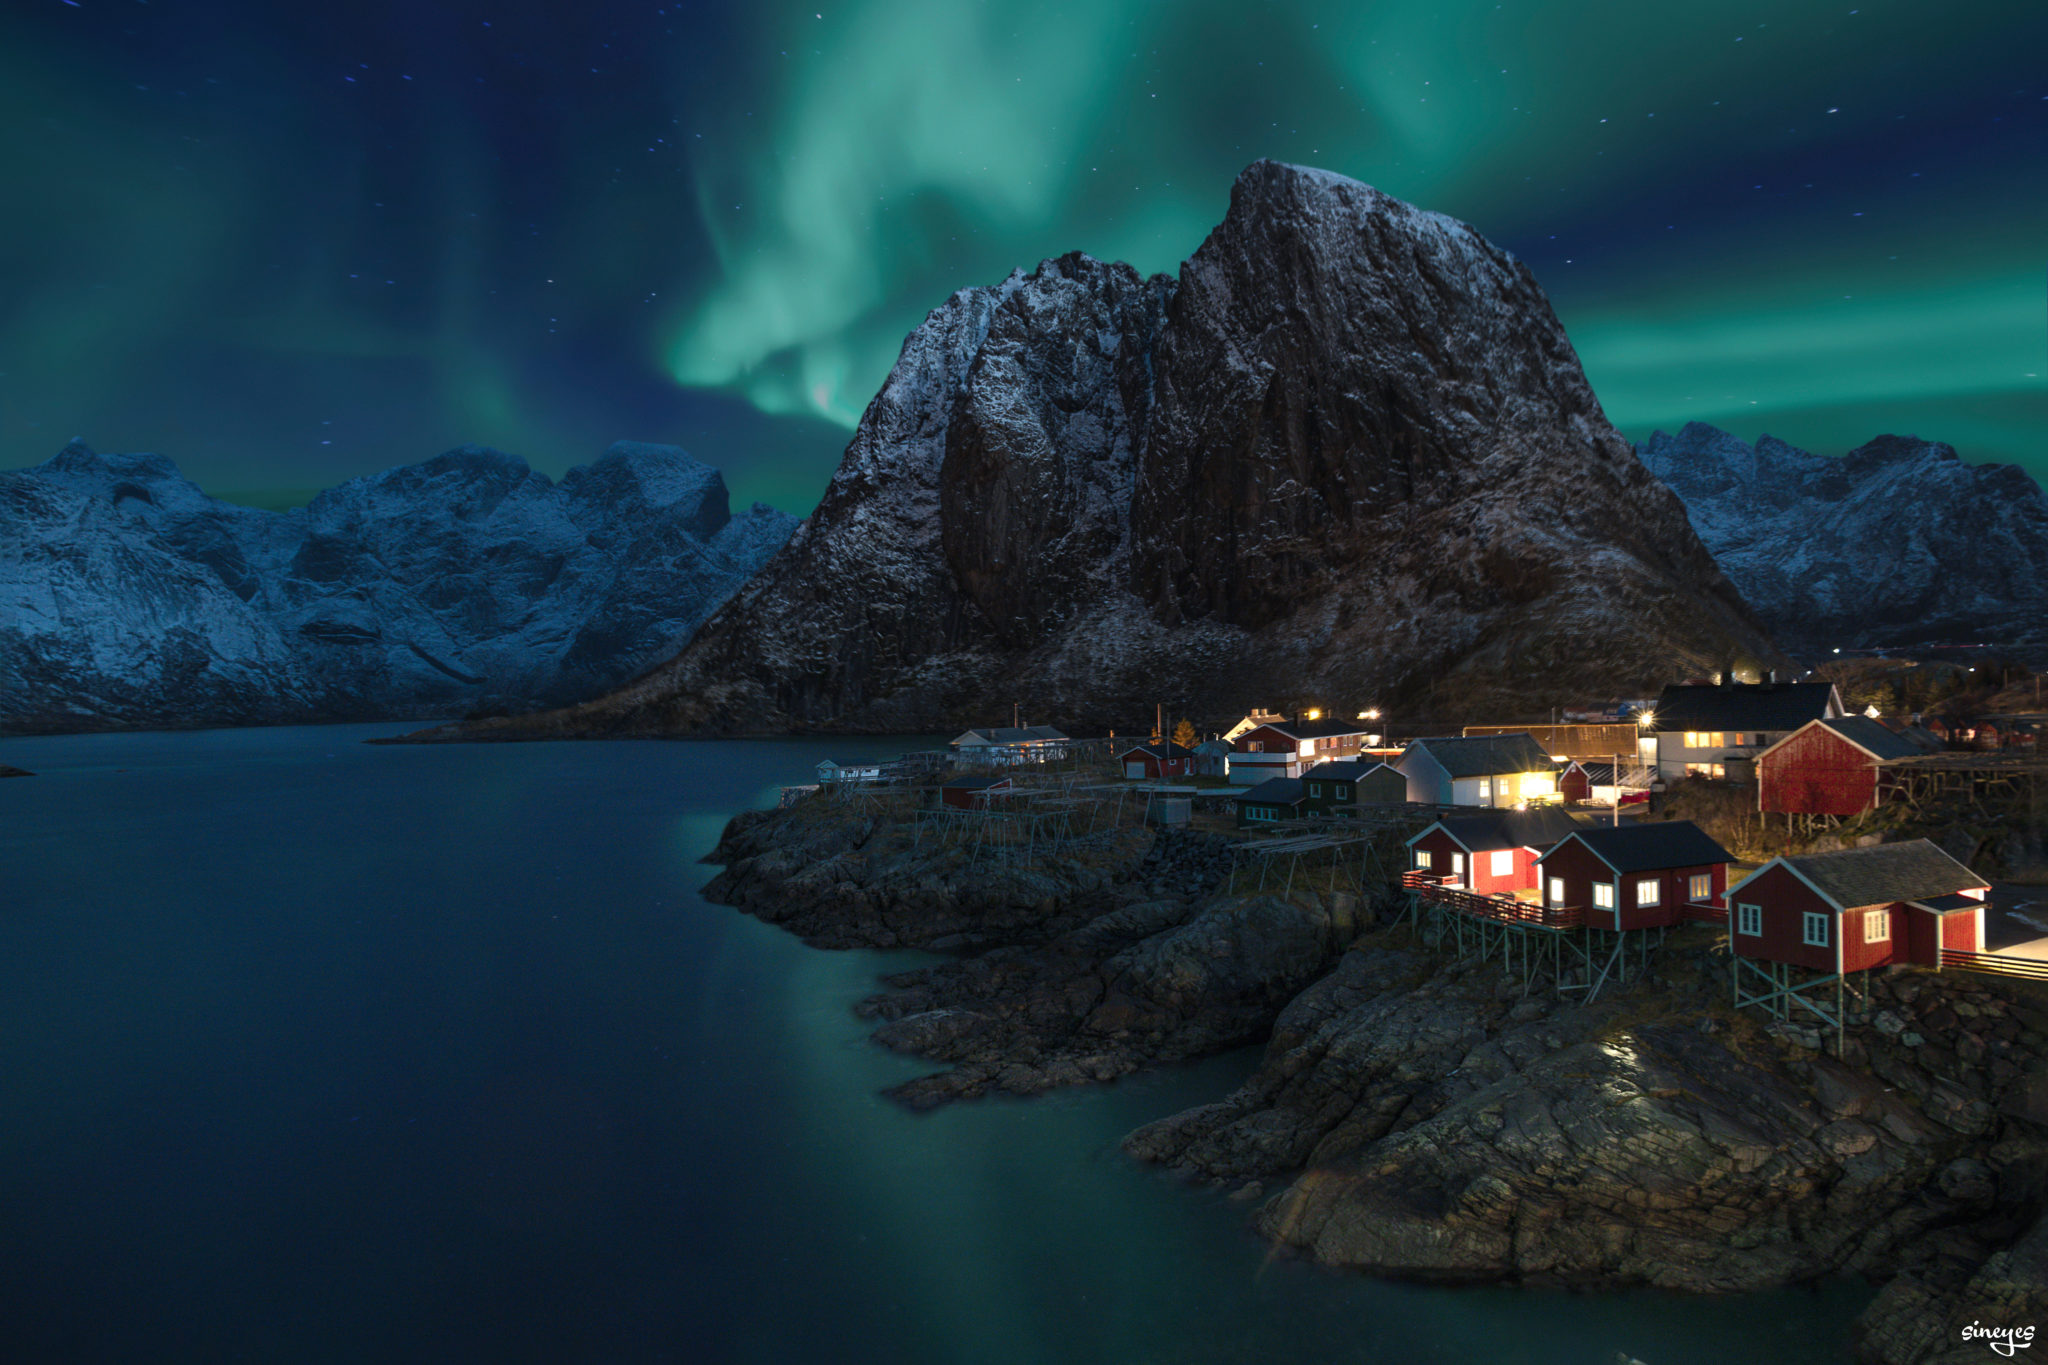 Nuit - Hamnoy, Norvège by sineyes